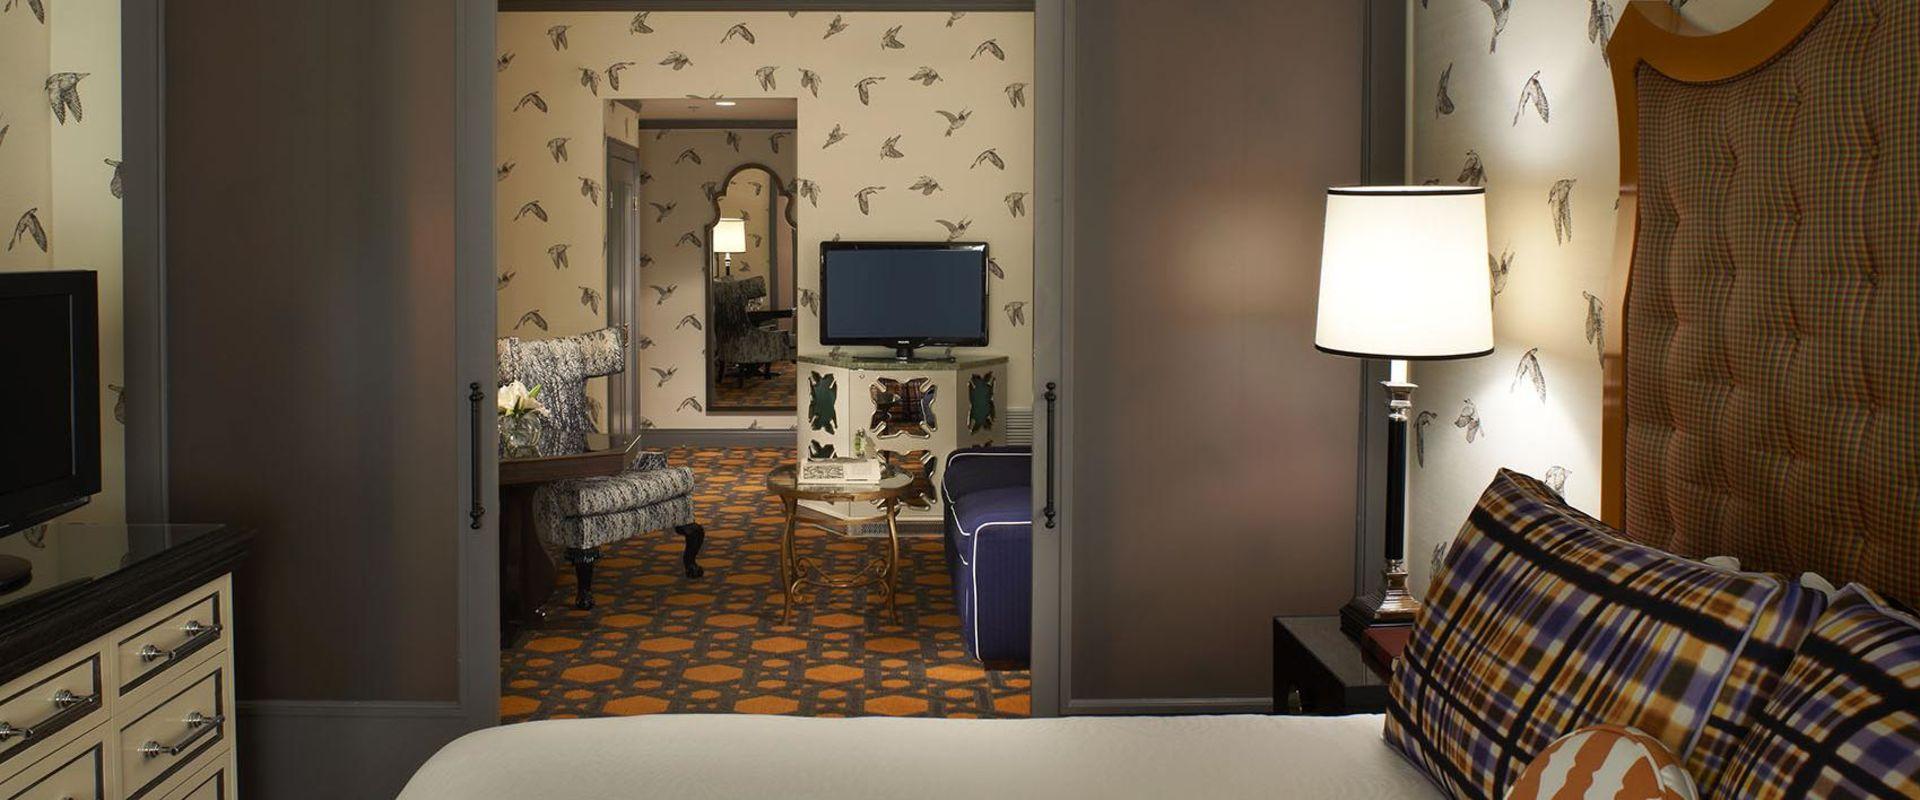 Portland Guest Room with Sliding Doors